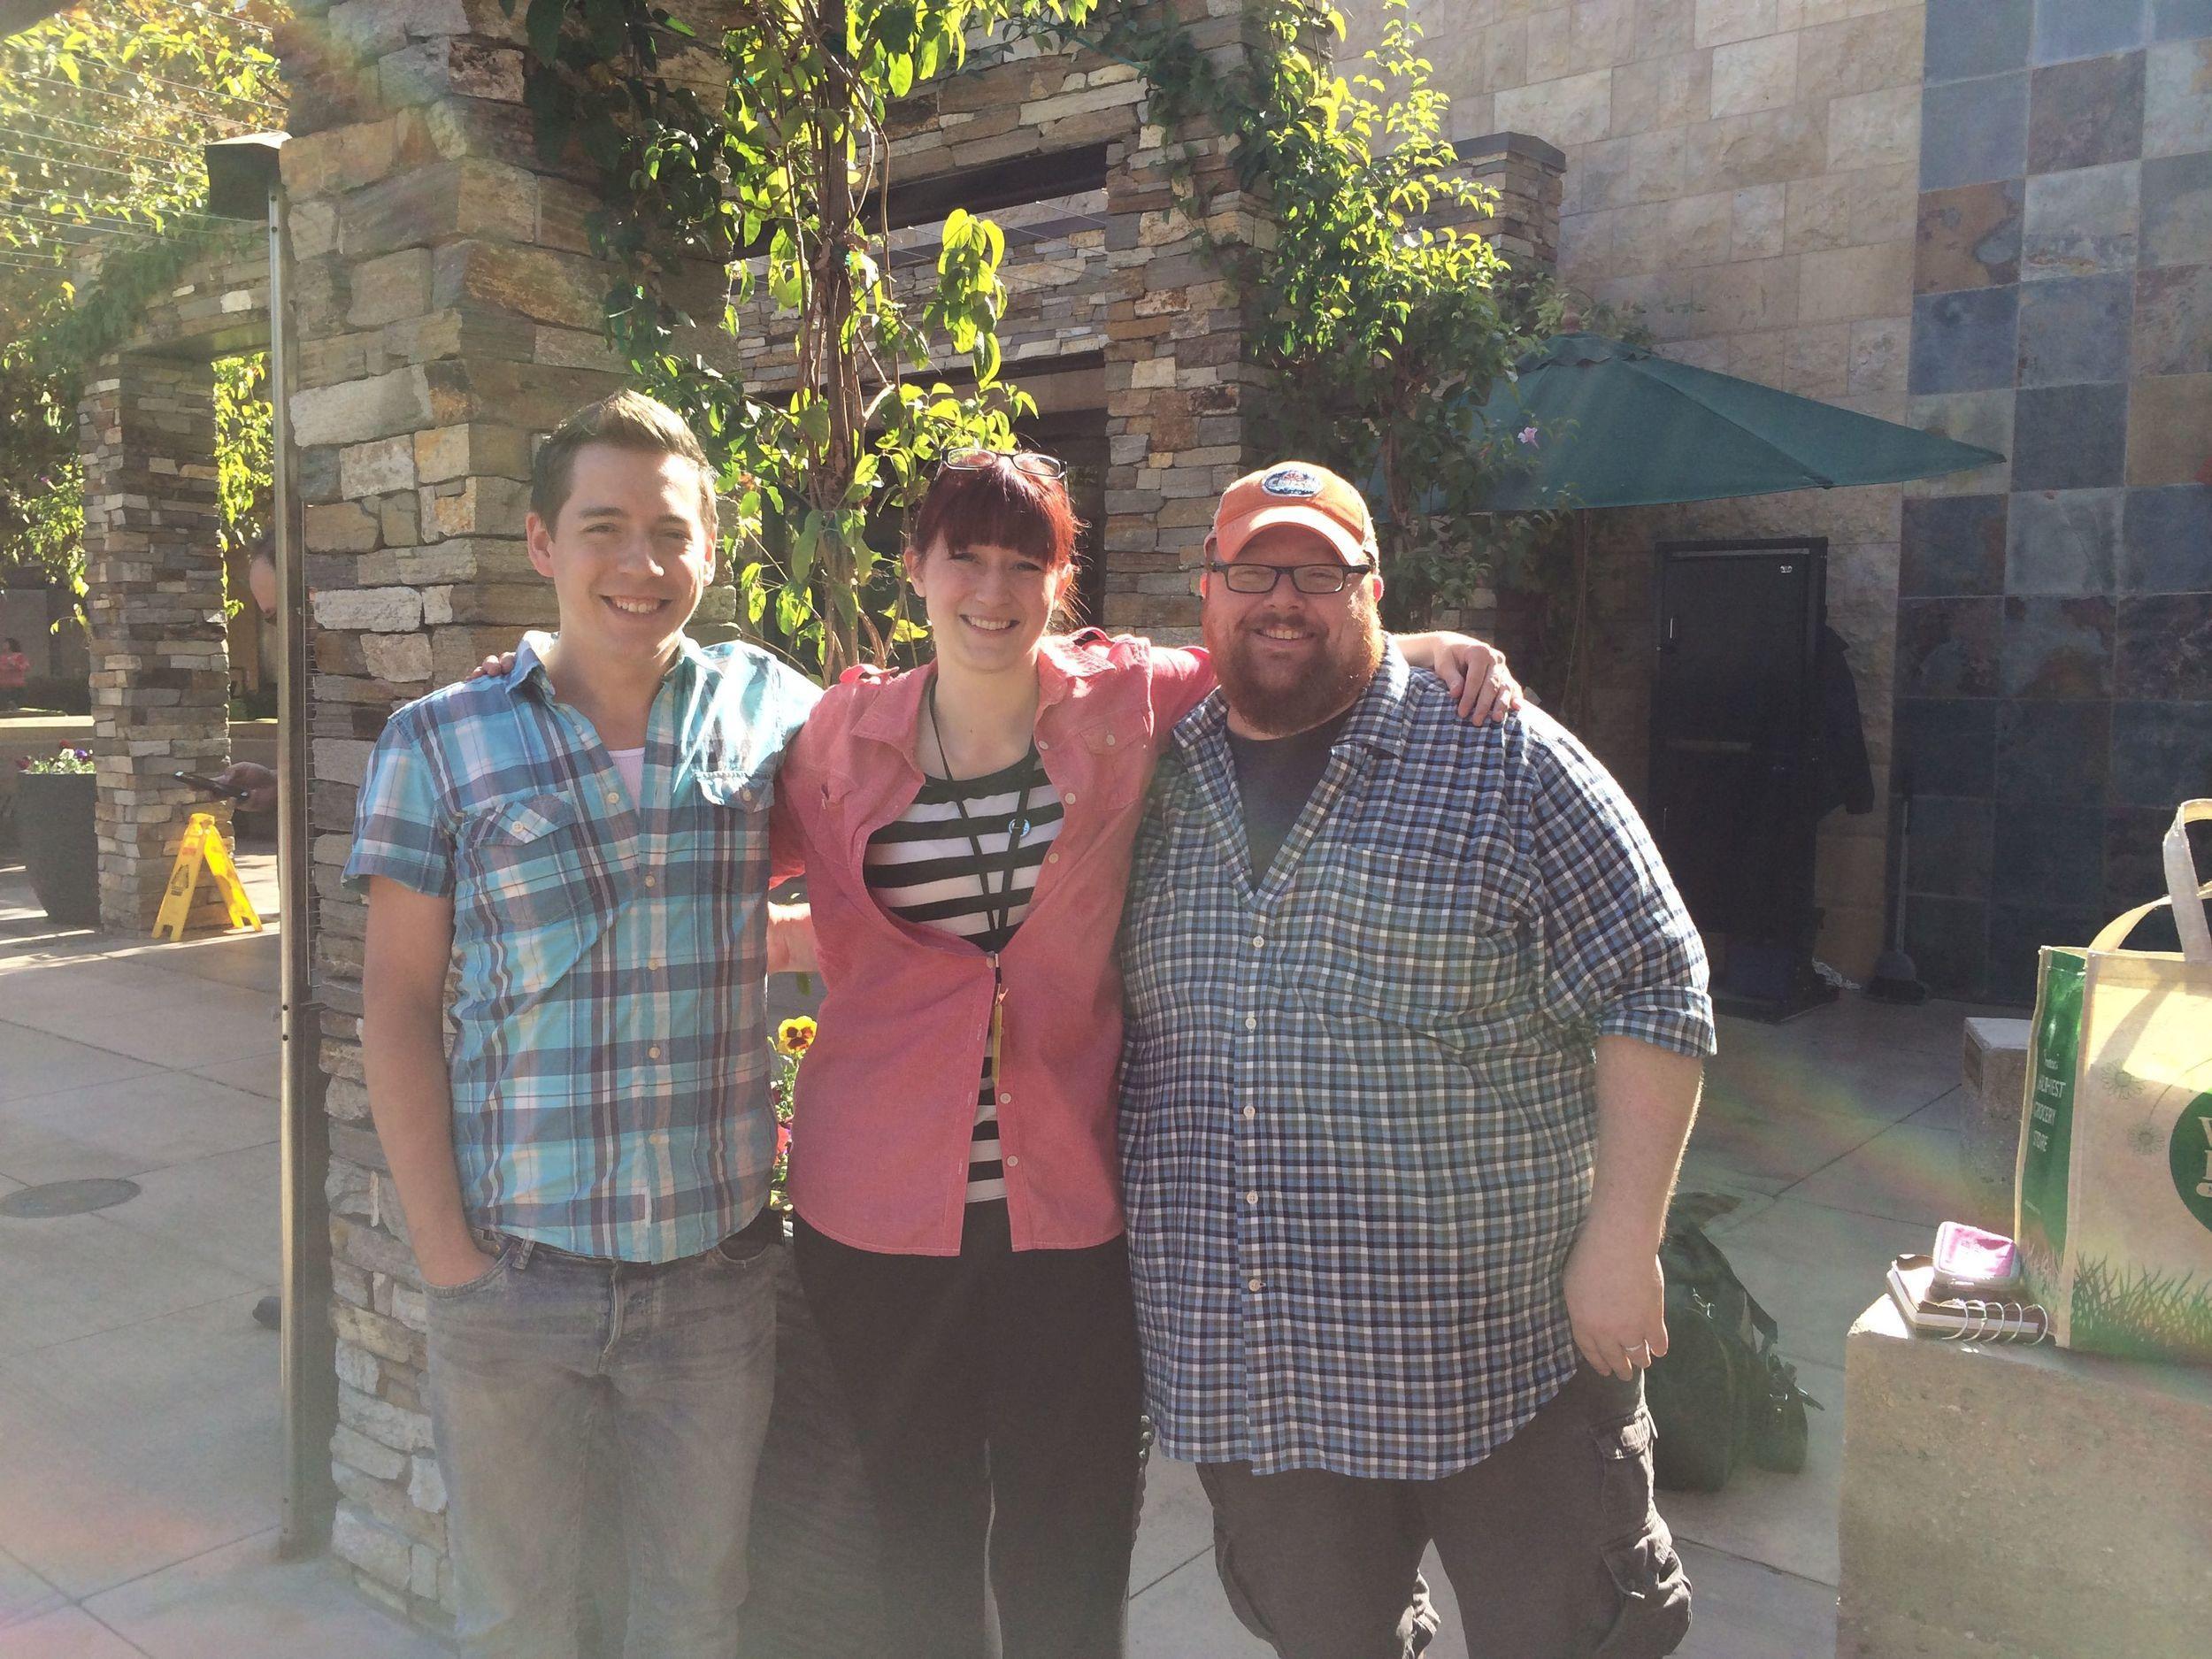 Me, Jessie and Shaun again